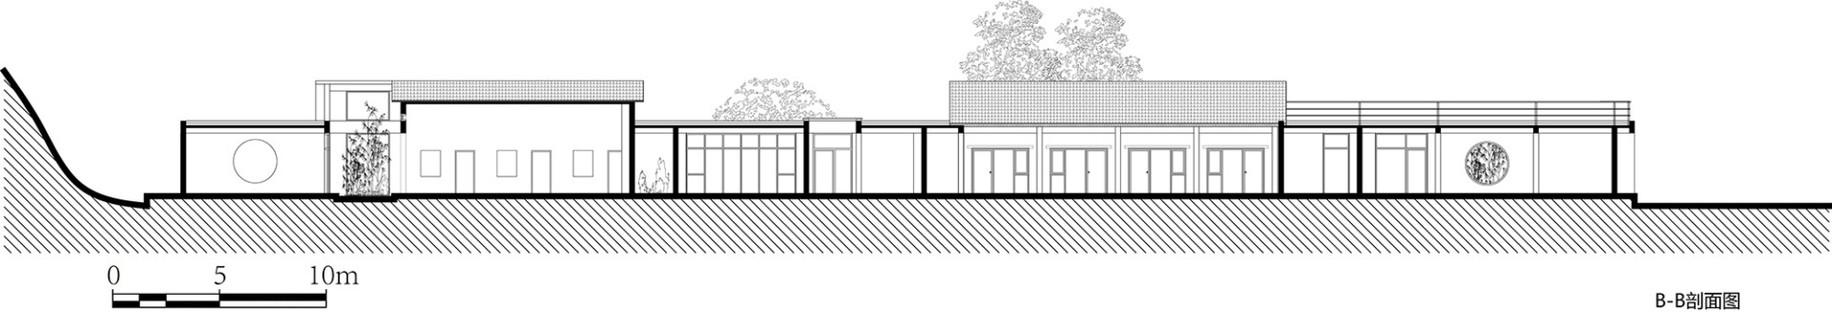 3andwich Design / He Wei Studio signent le B Garden